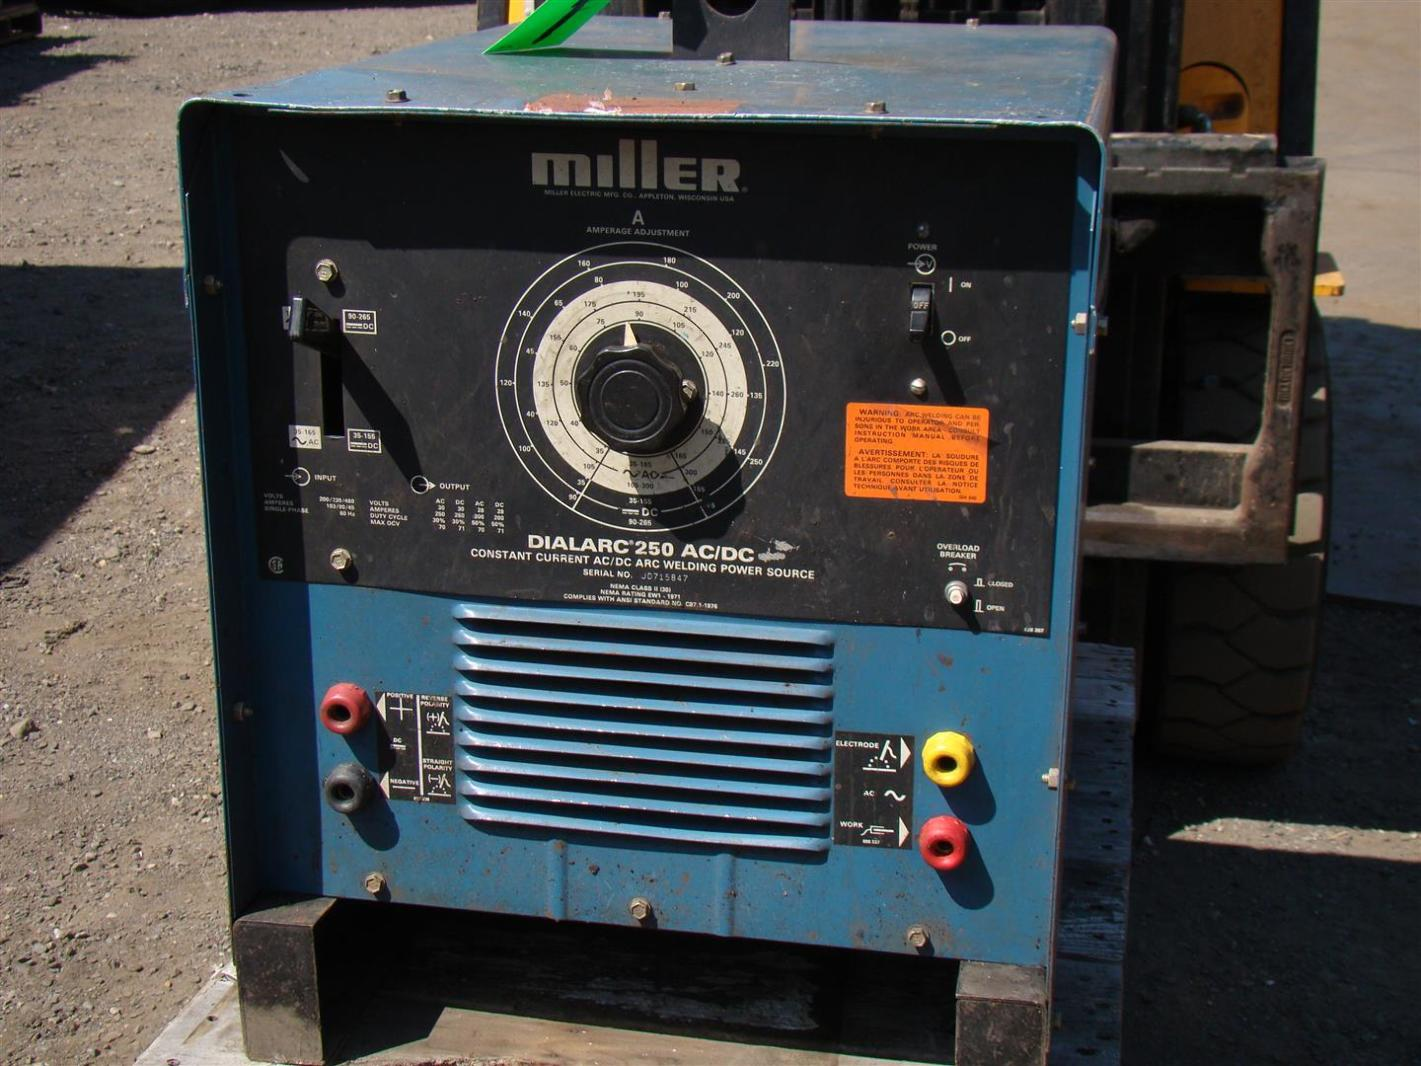 Miller Dialarc 250 AC/DC CC Welder 200/230/460 Volt Single Phase